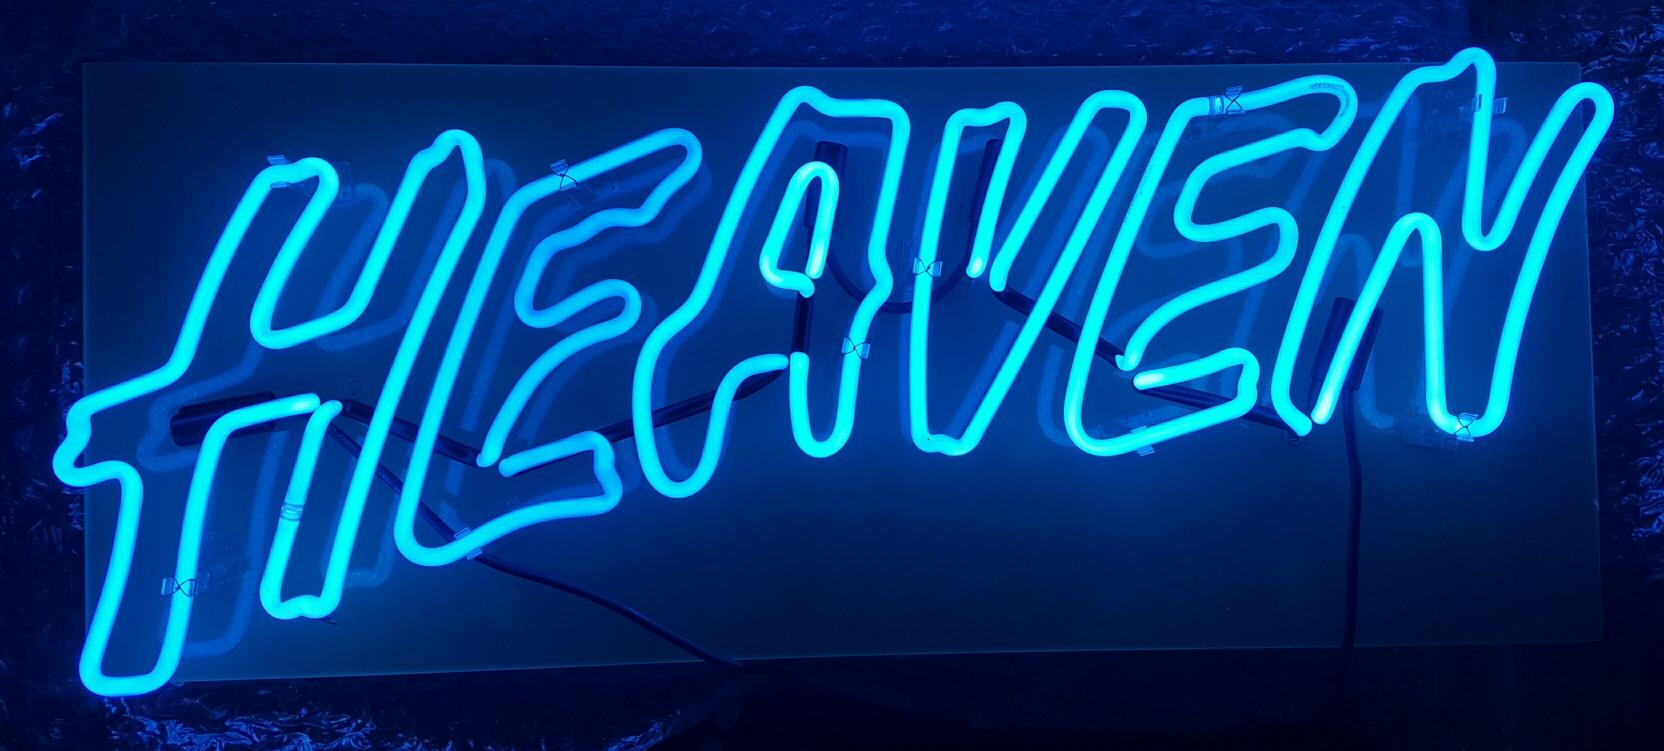 NeonBluewhtglass.jpg